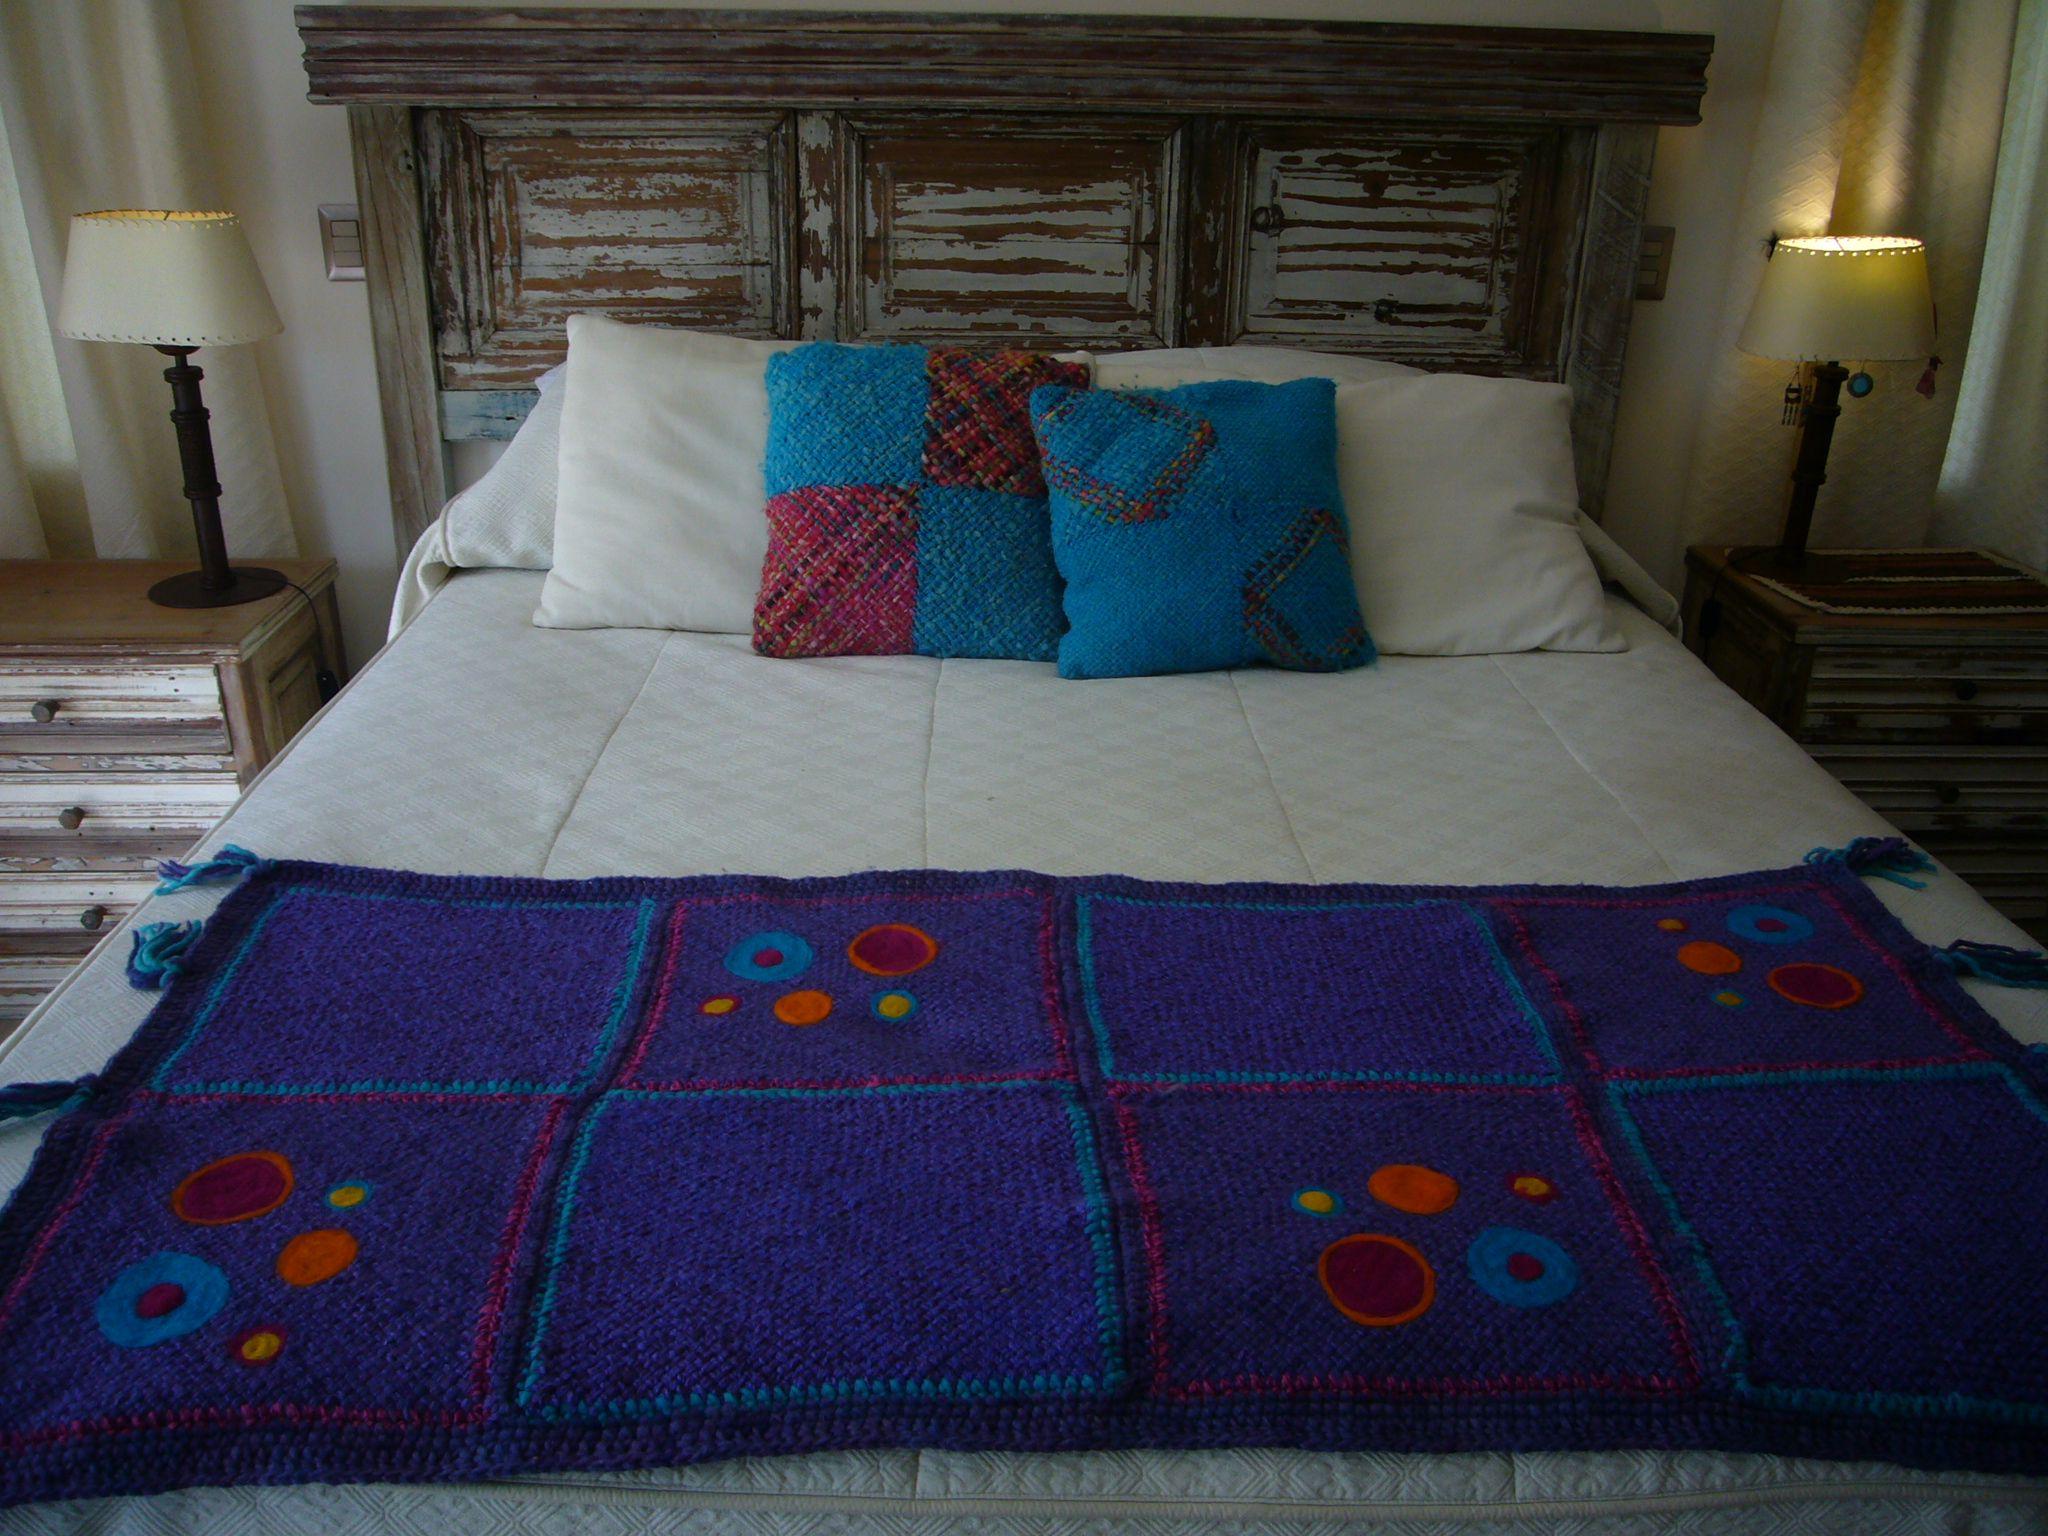 piecera de una plaza 150x68 tejida en telar artesanal ,bordada a ...